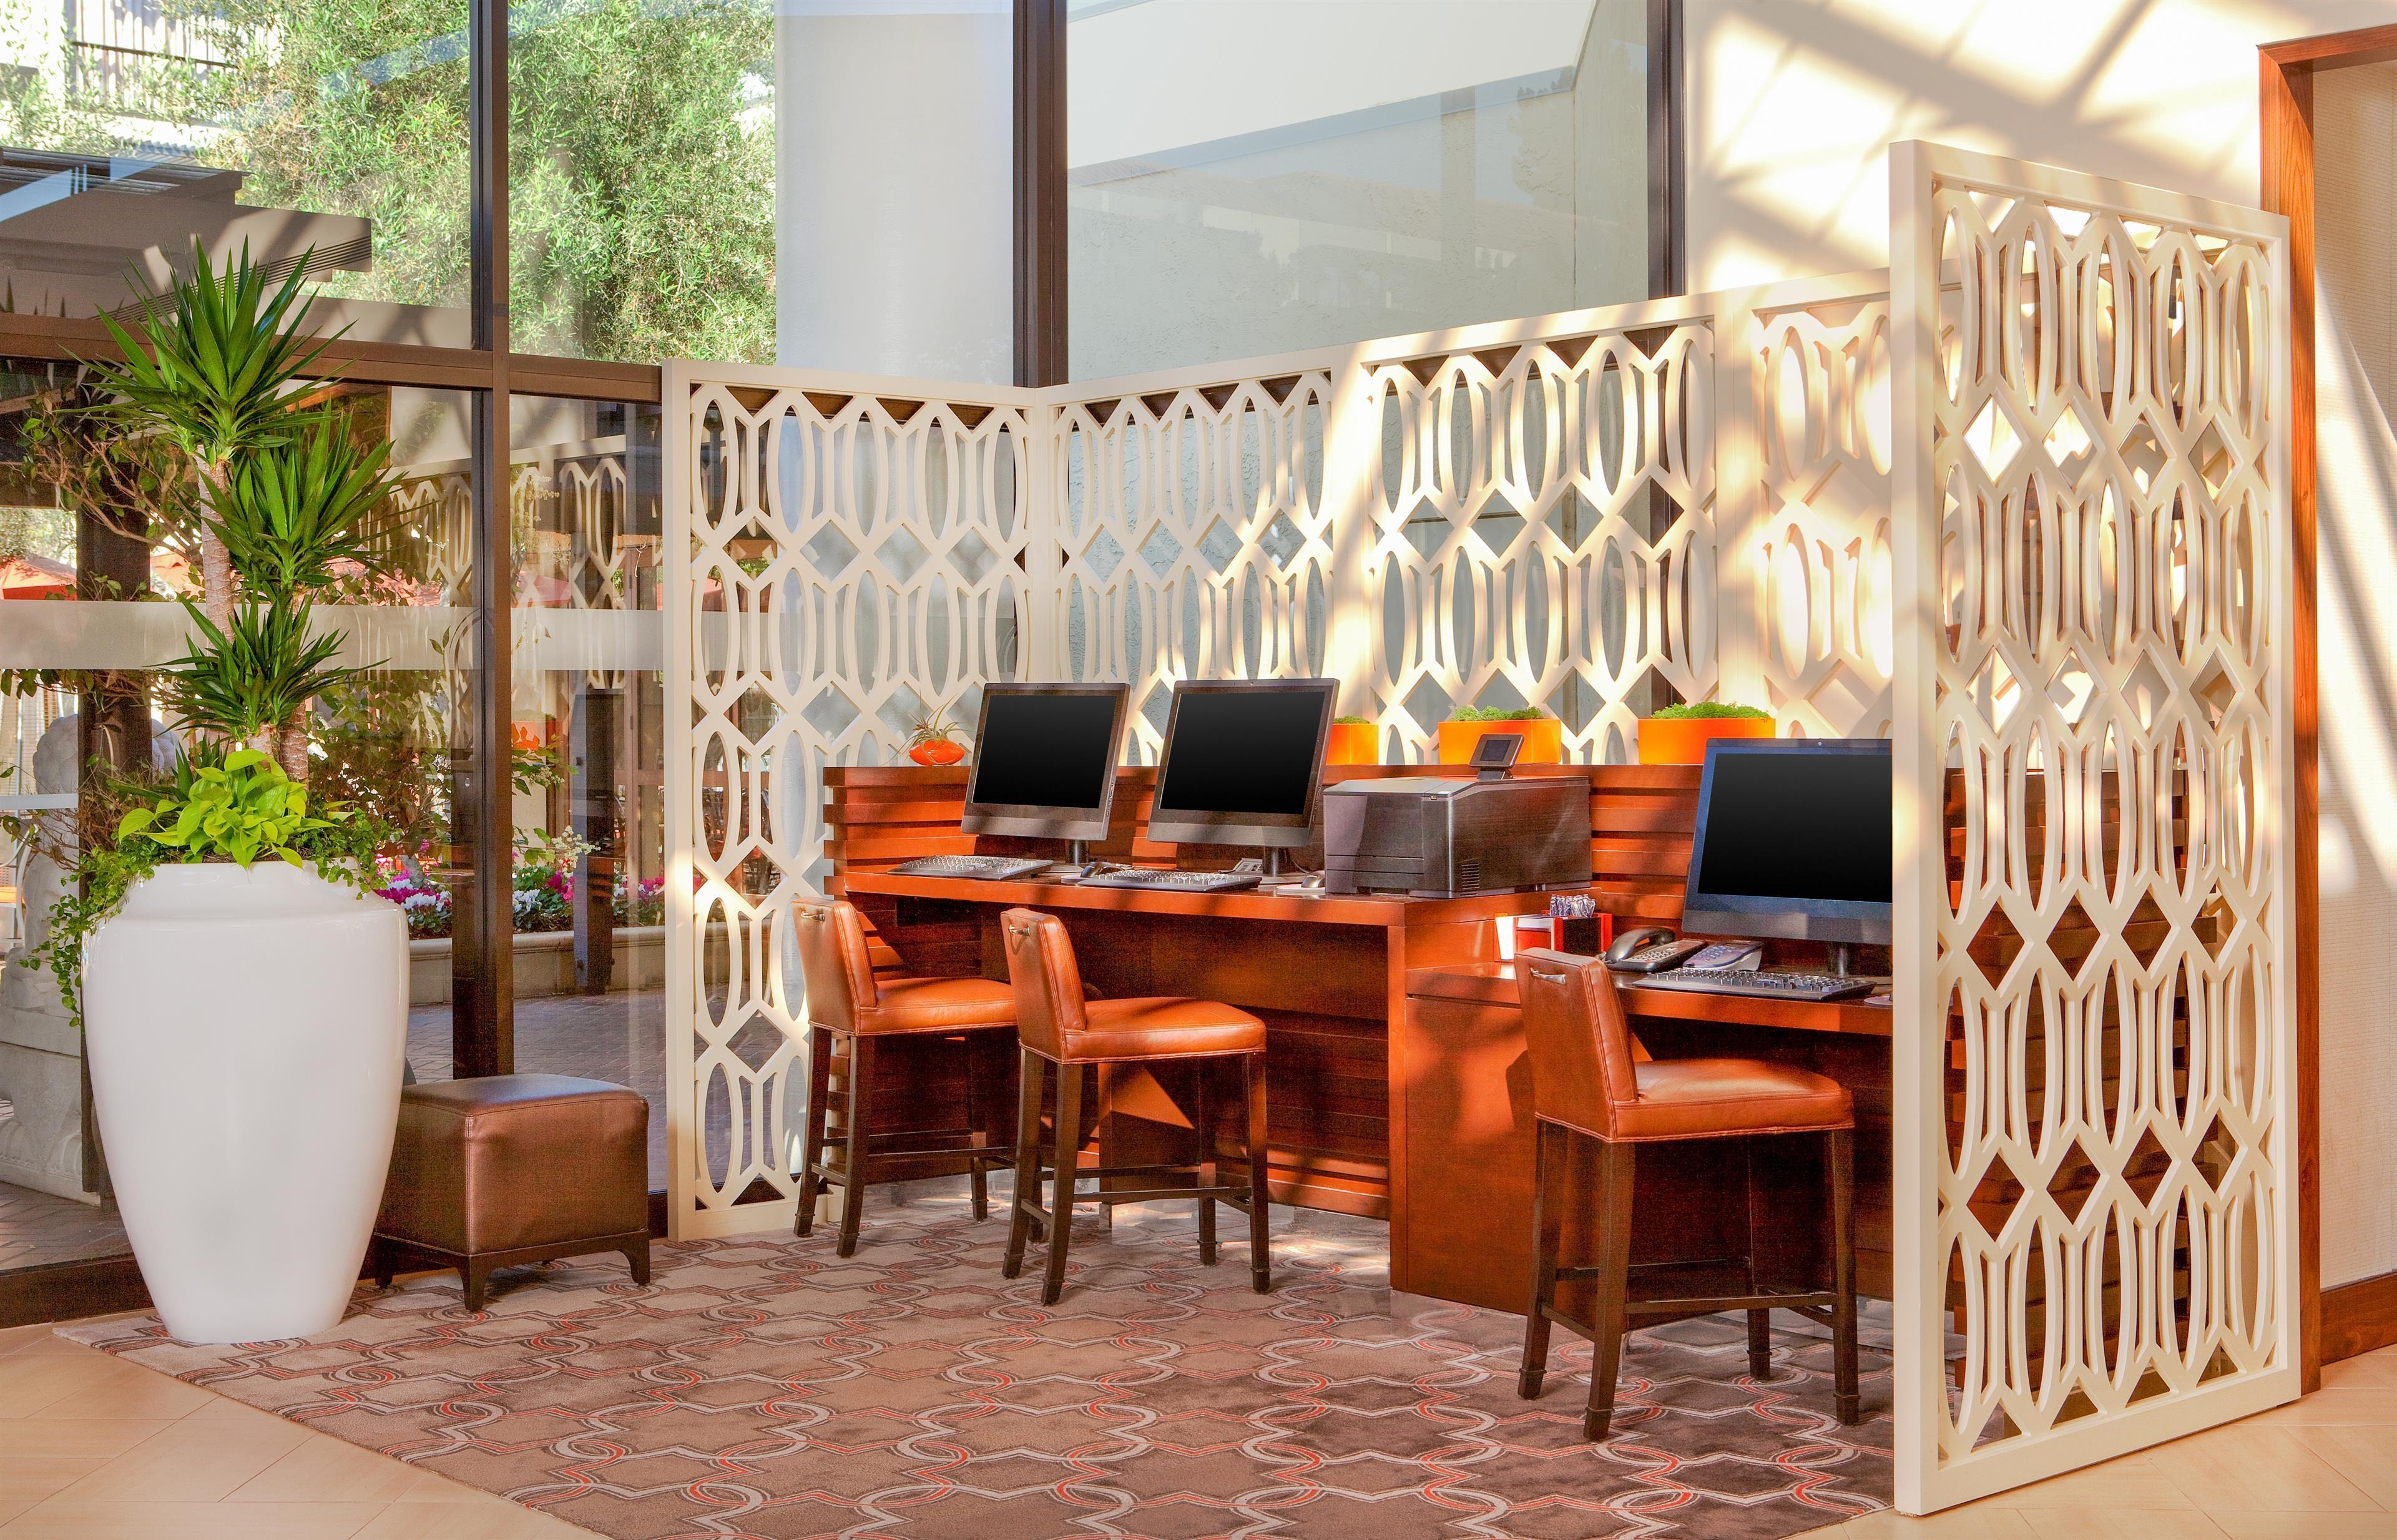 Sheraton Palo Alto Hotel image 16